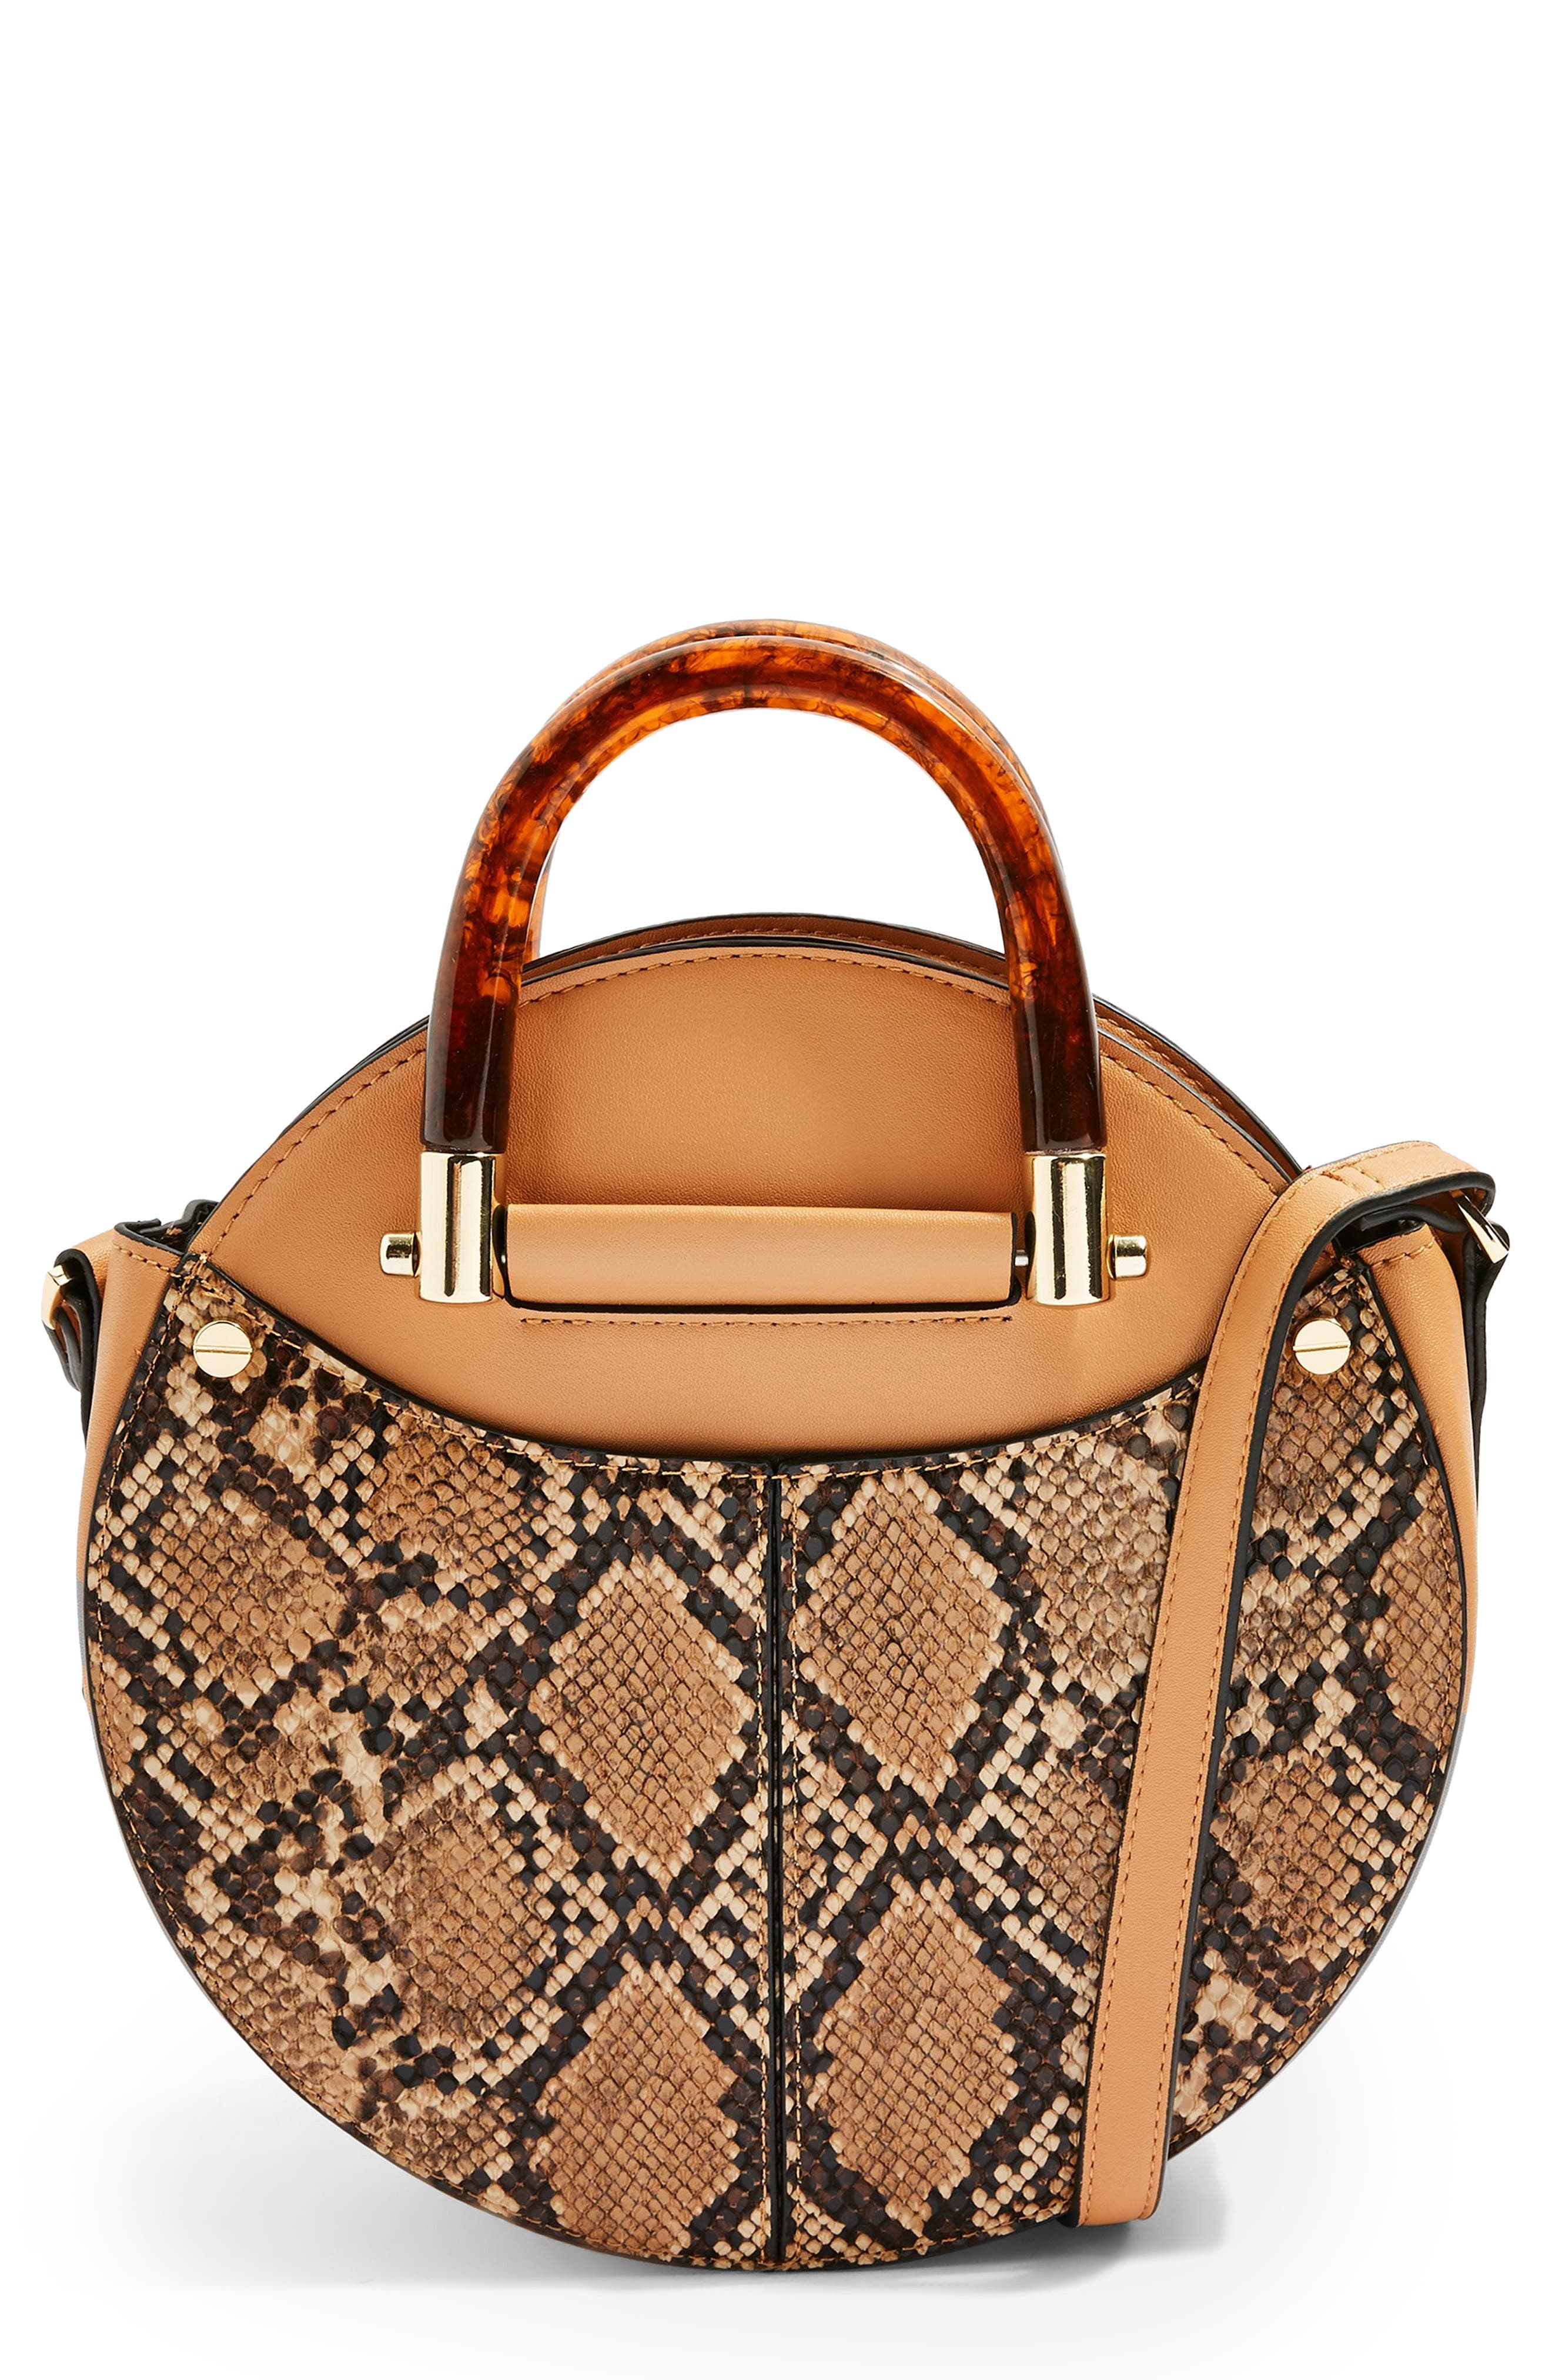 Taylor Crossbody Bag by Topshop